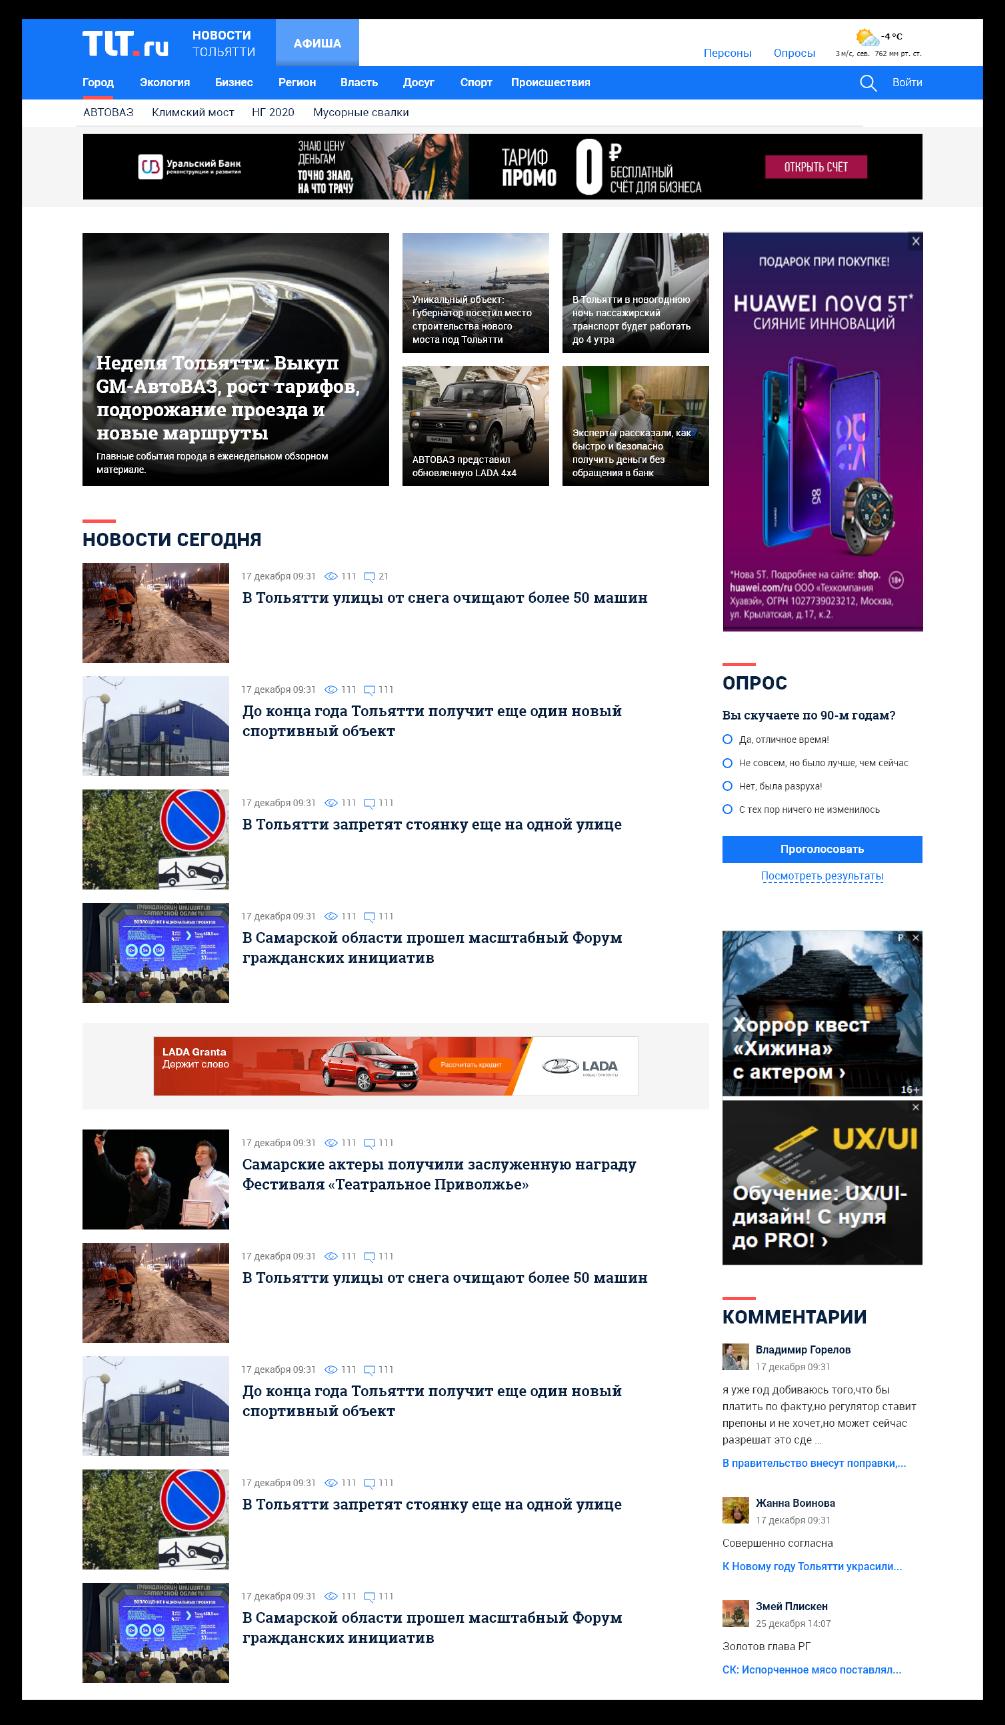 Главная страница TLT.ru